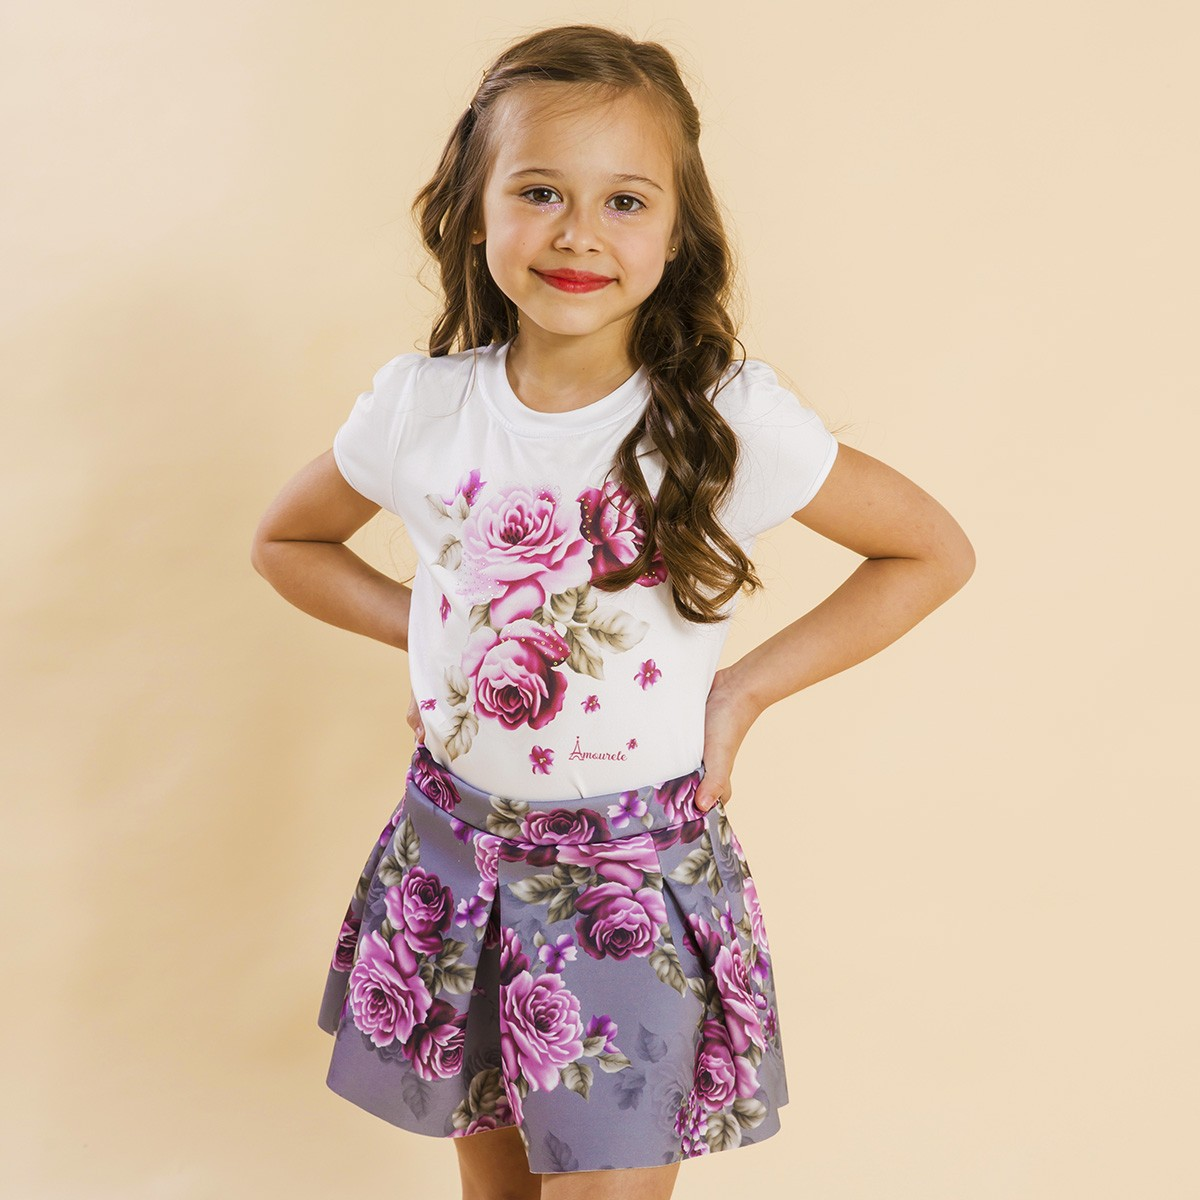 Conjunto Infantil Shorts Malha e Blusa Rosas Cinza